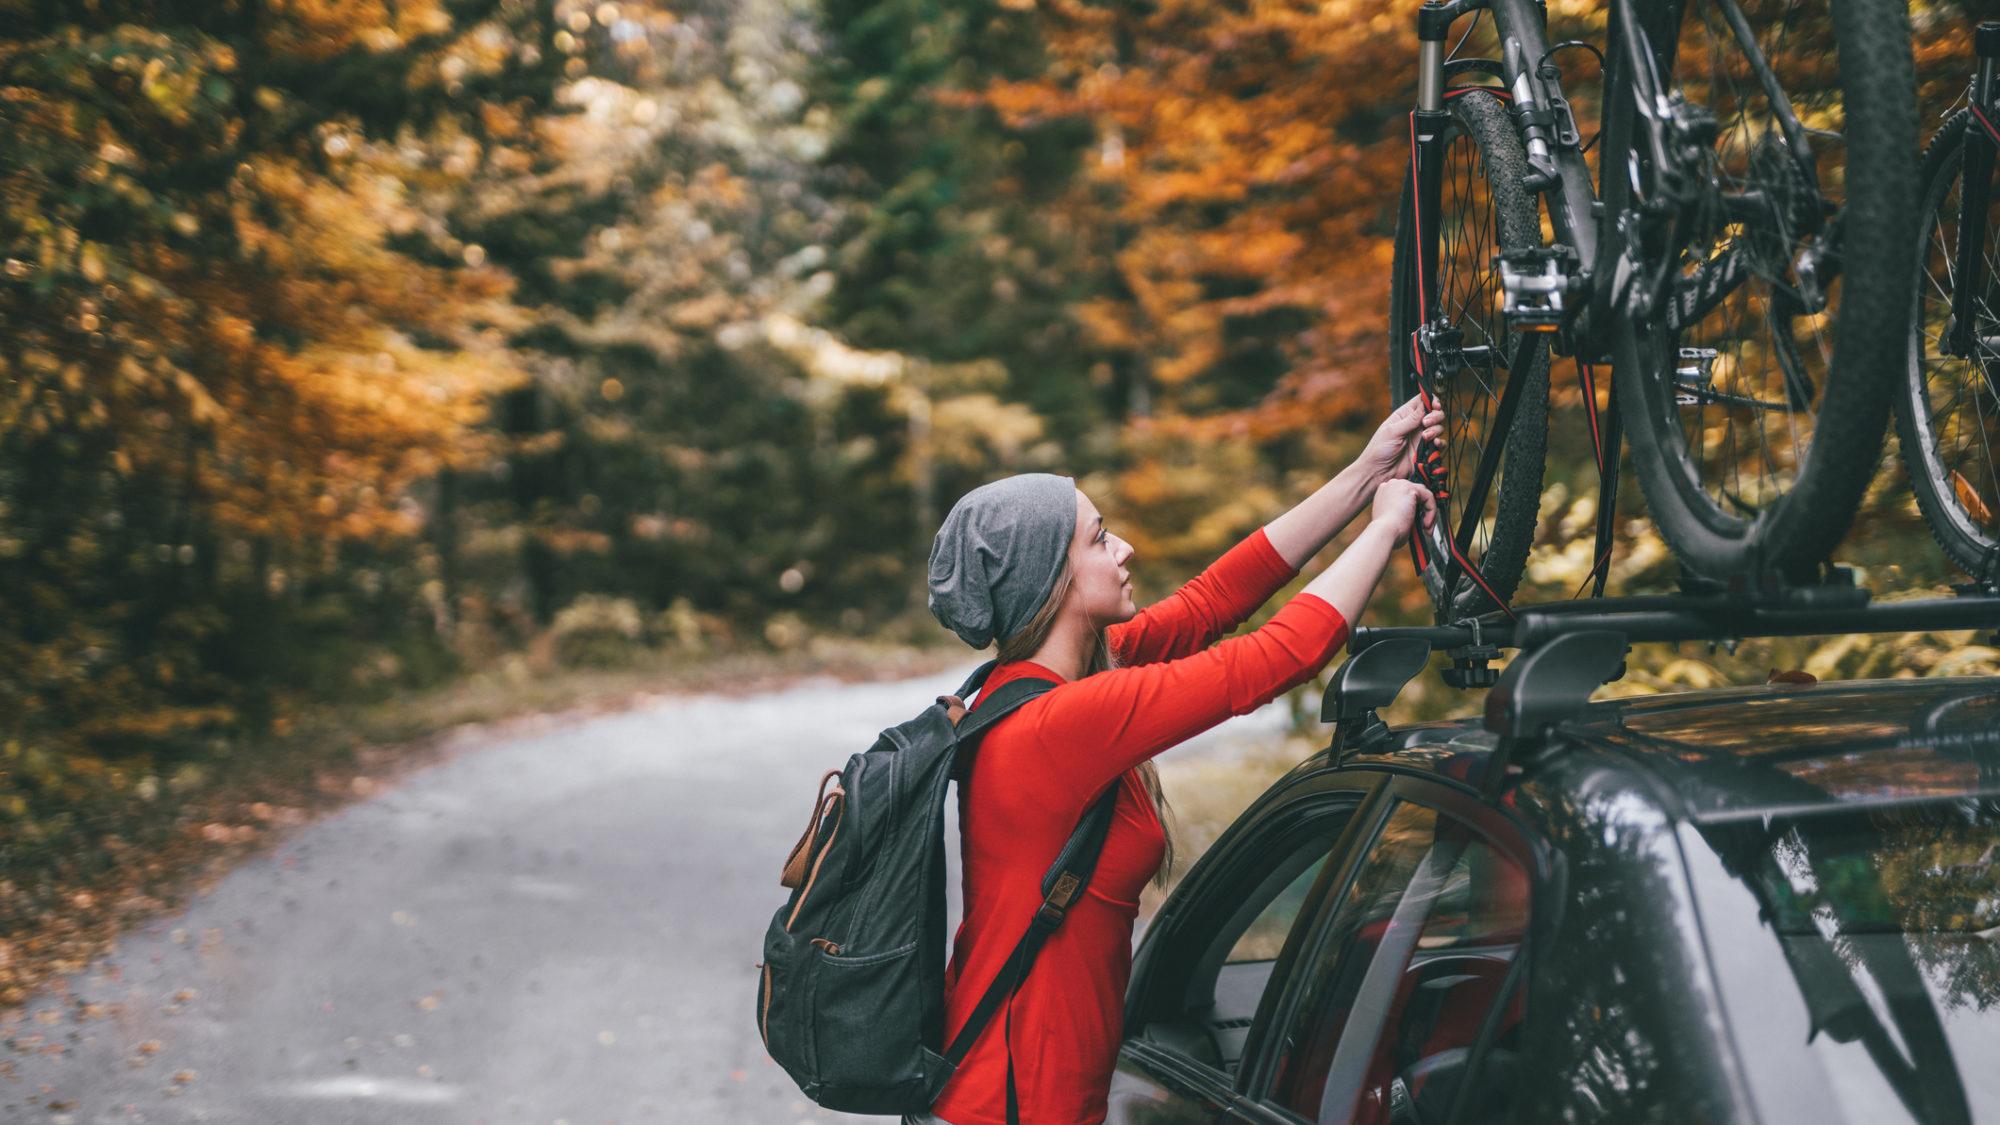 Bicicletas: como transportá-las no carro